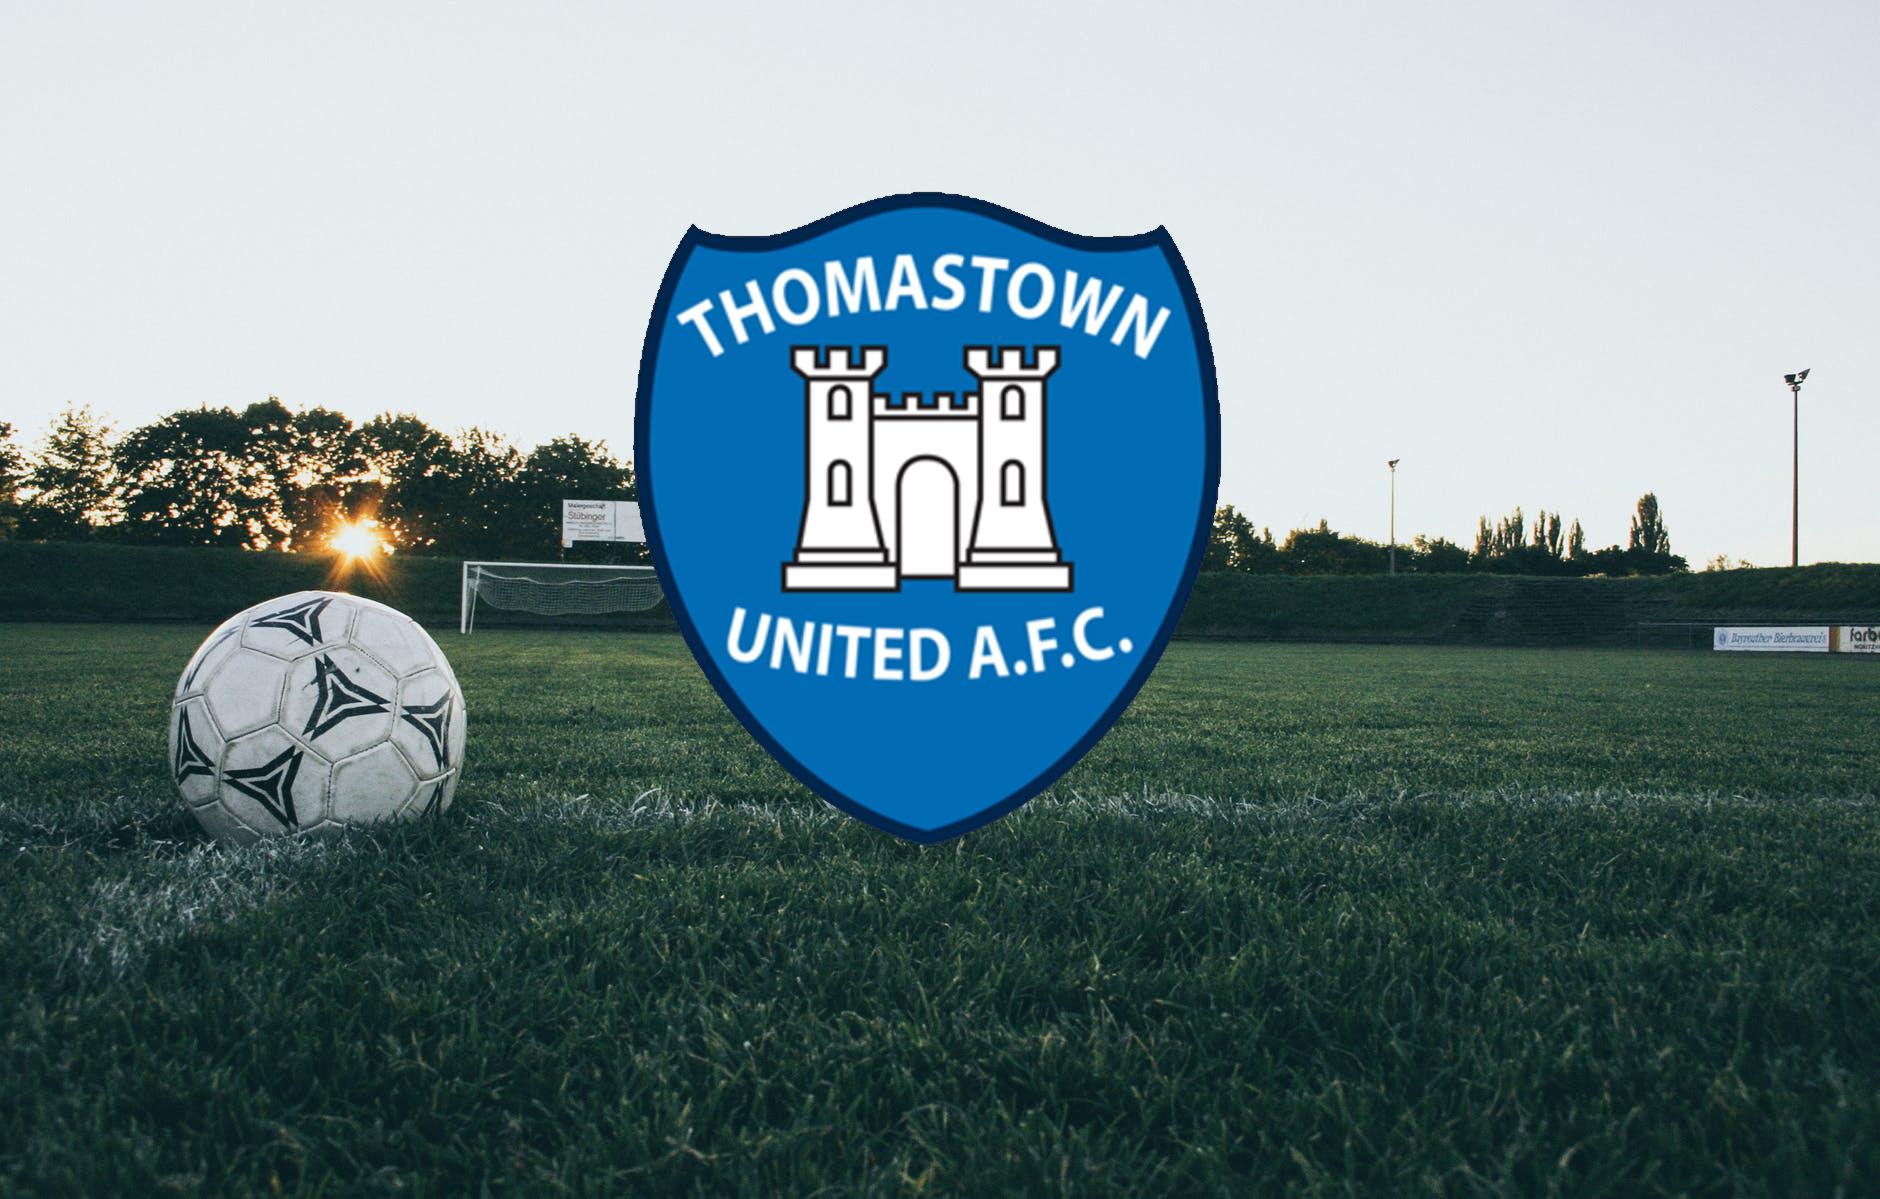 Thomastown United